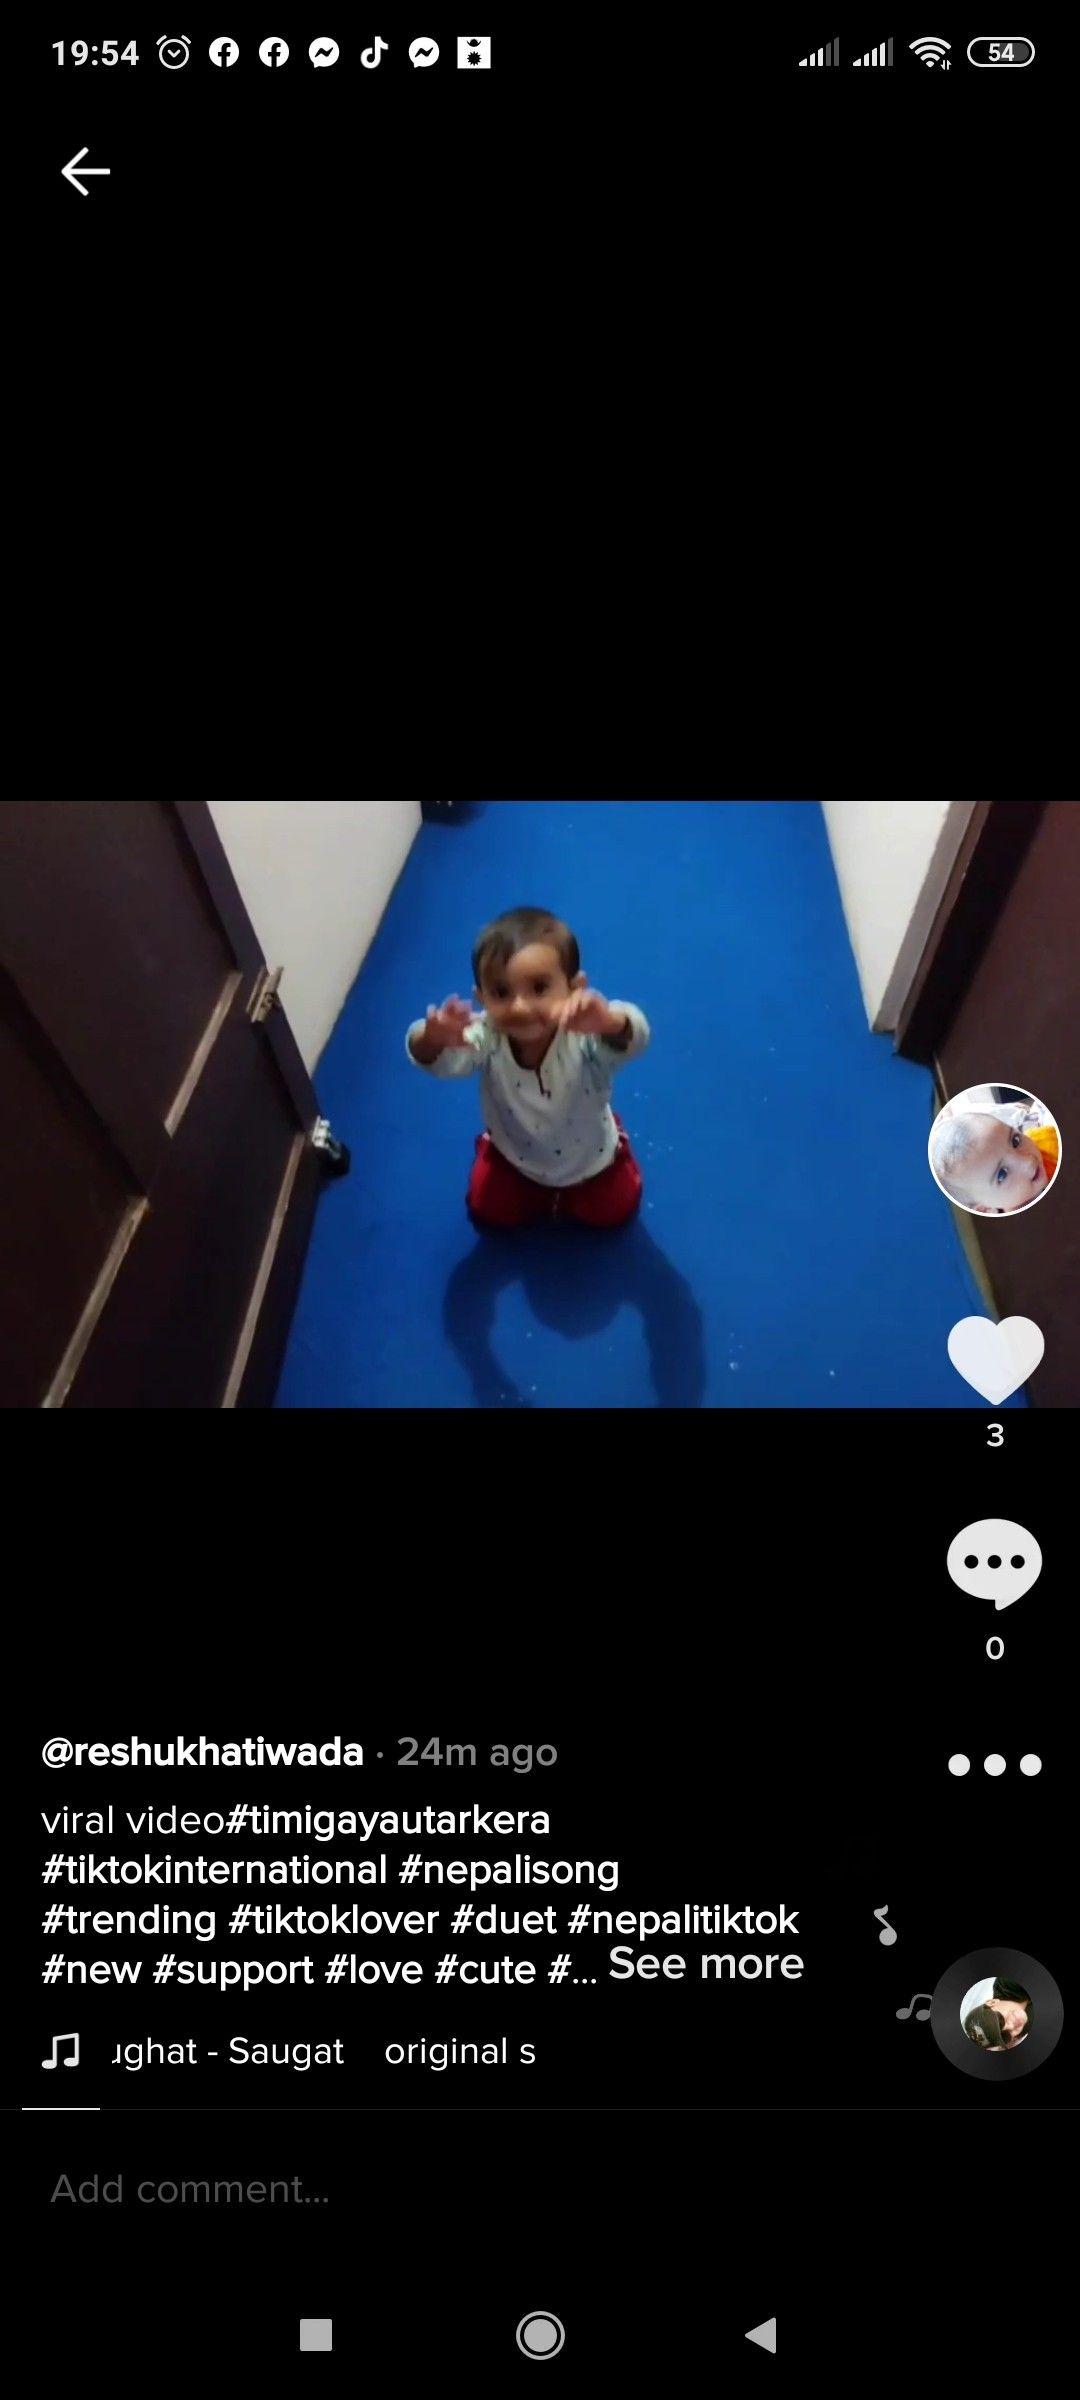 Viral Tiktok Video Nepali Song Viral Videos Viral